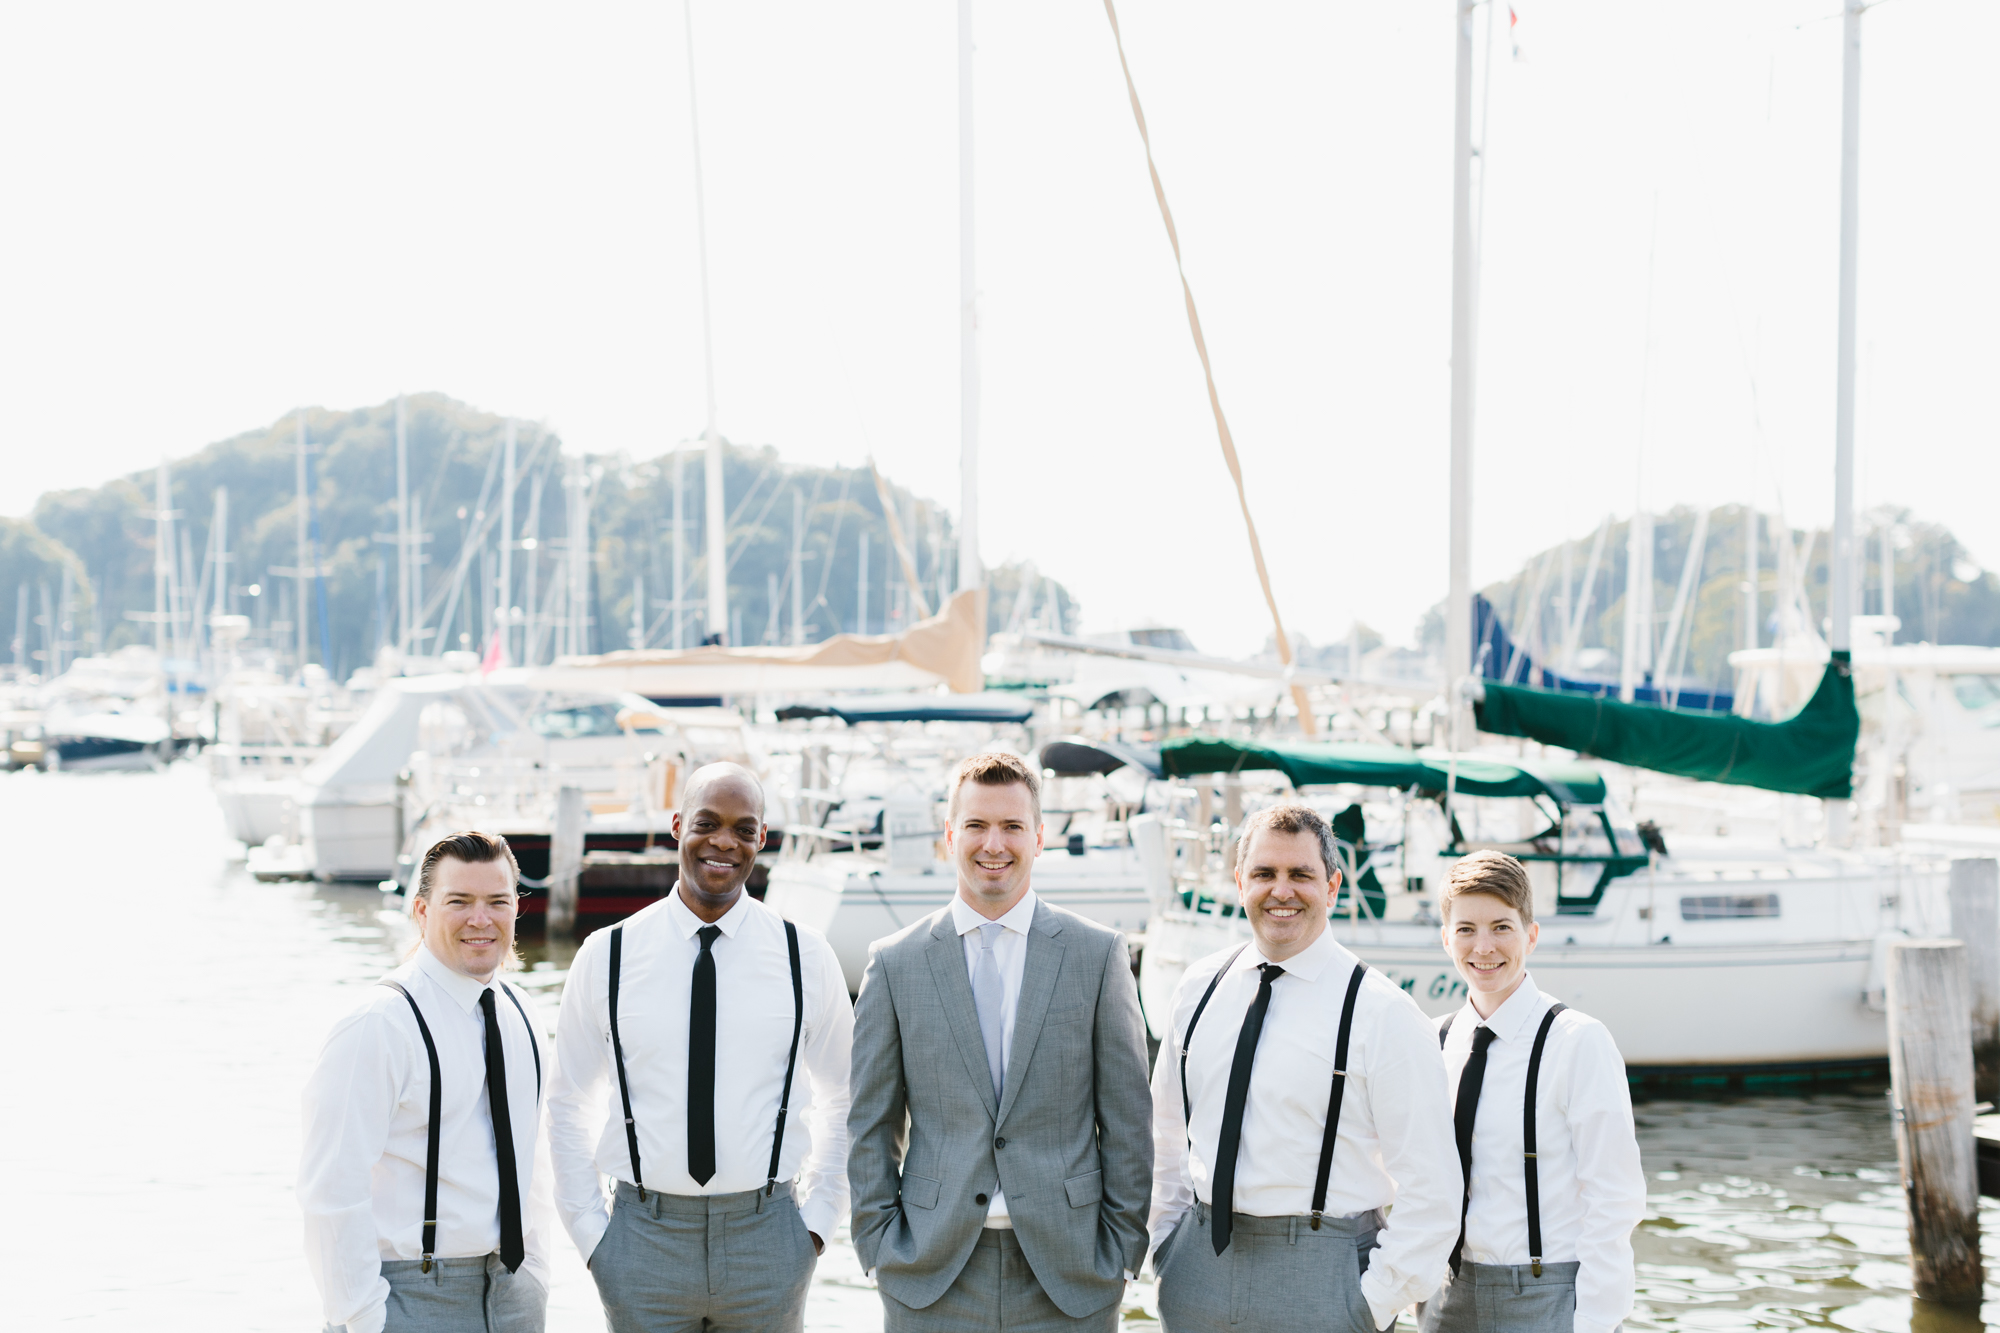 Holland Lake Michigan Wedding Photographer Mae Stier-042.jpg